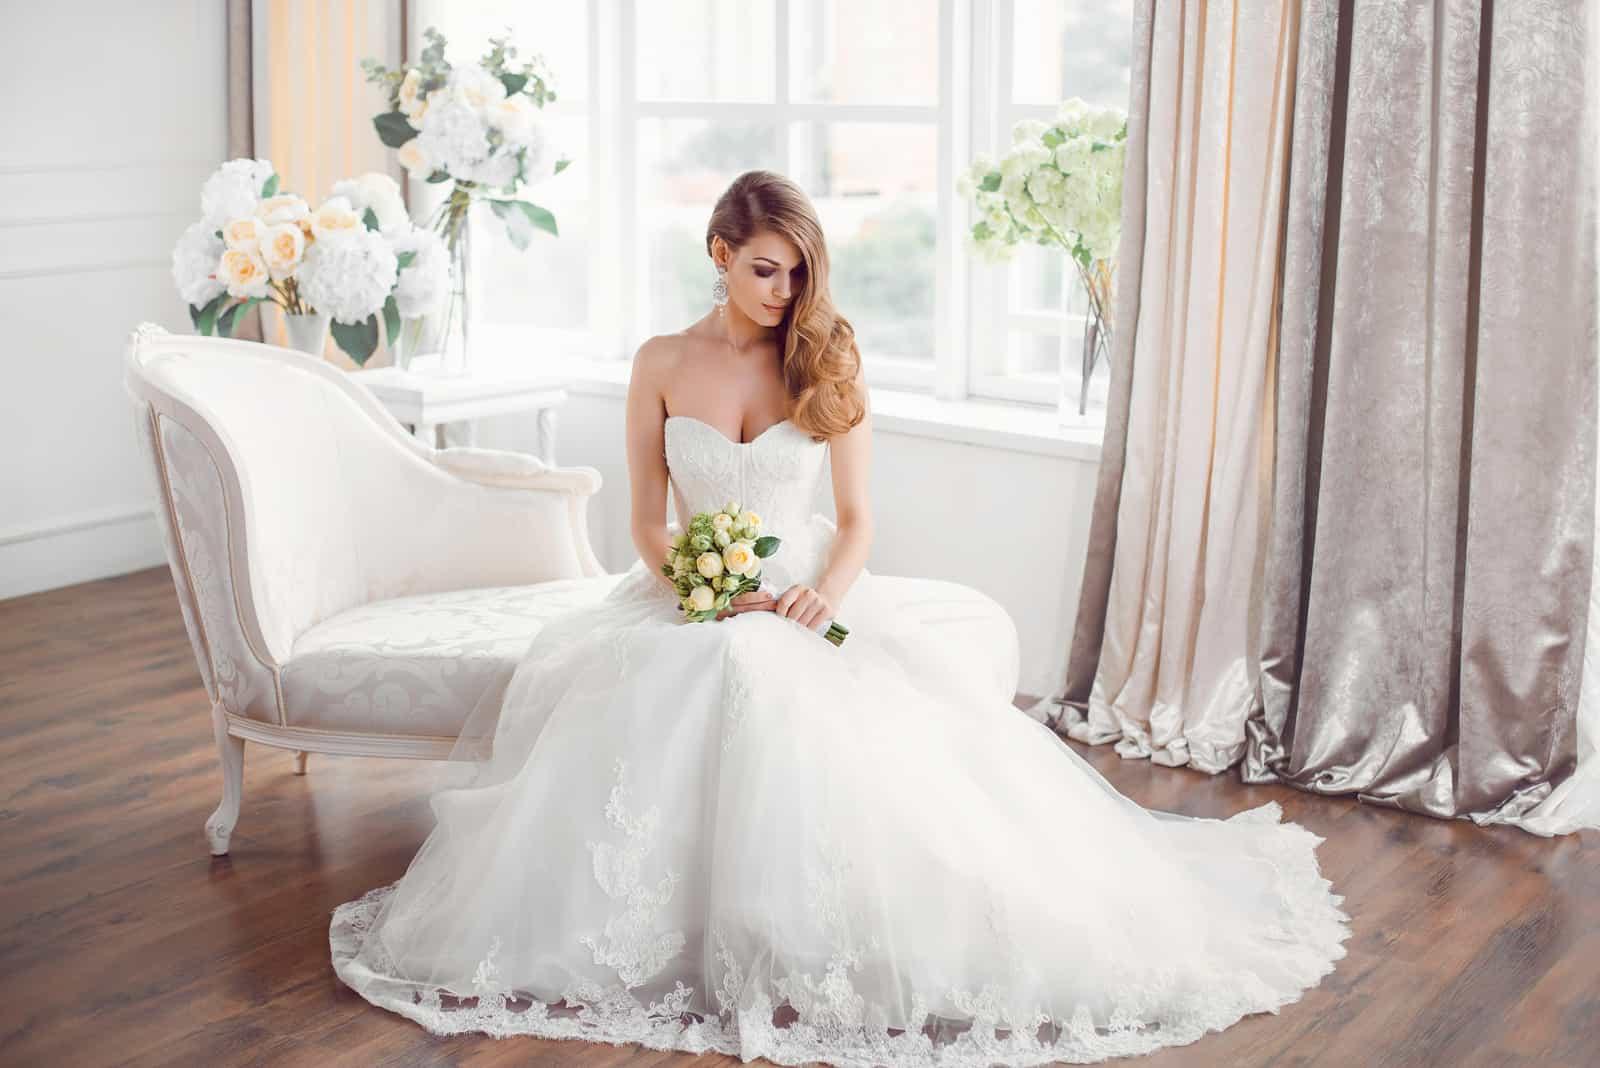 Bride in beautiful dress sitting on sofa